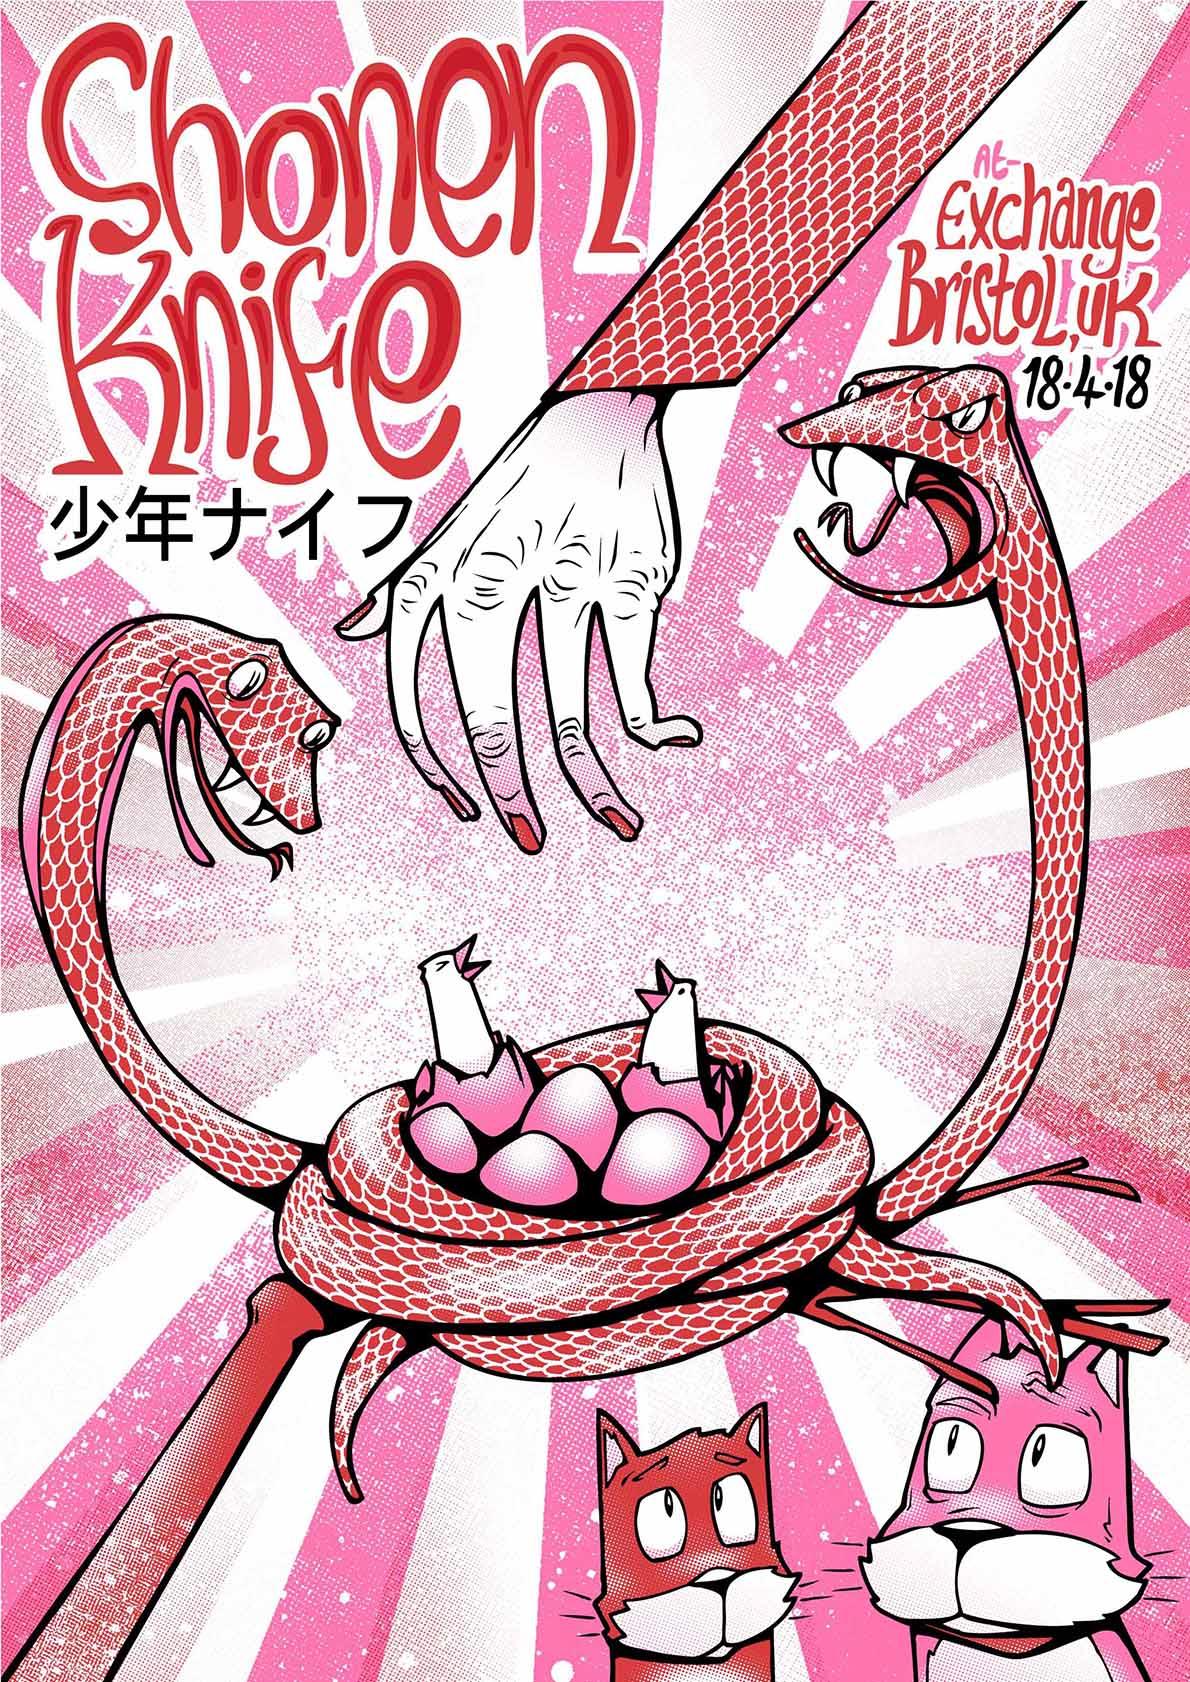 Shonen Knife gig poster. 3 Colour screen print '18